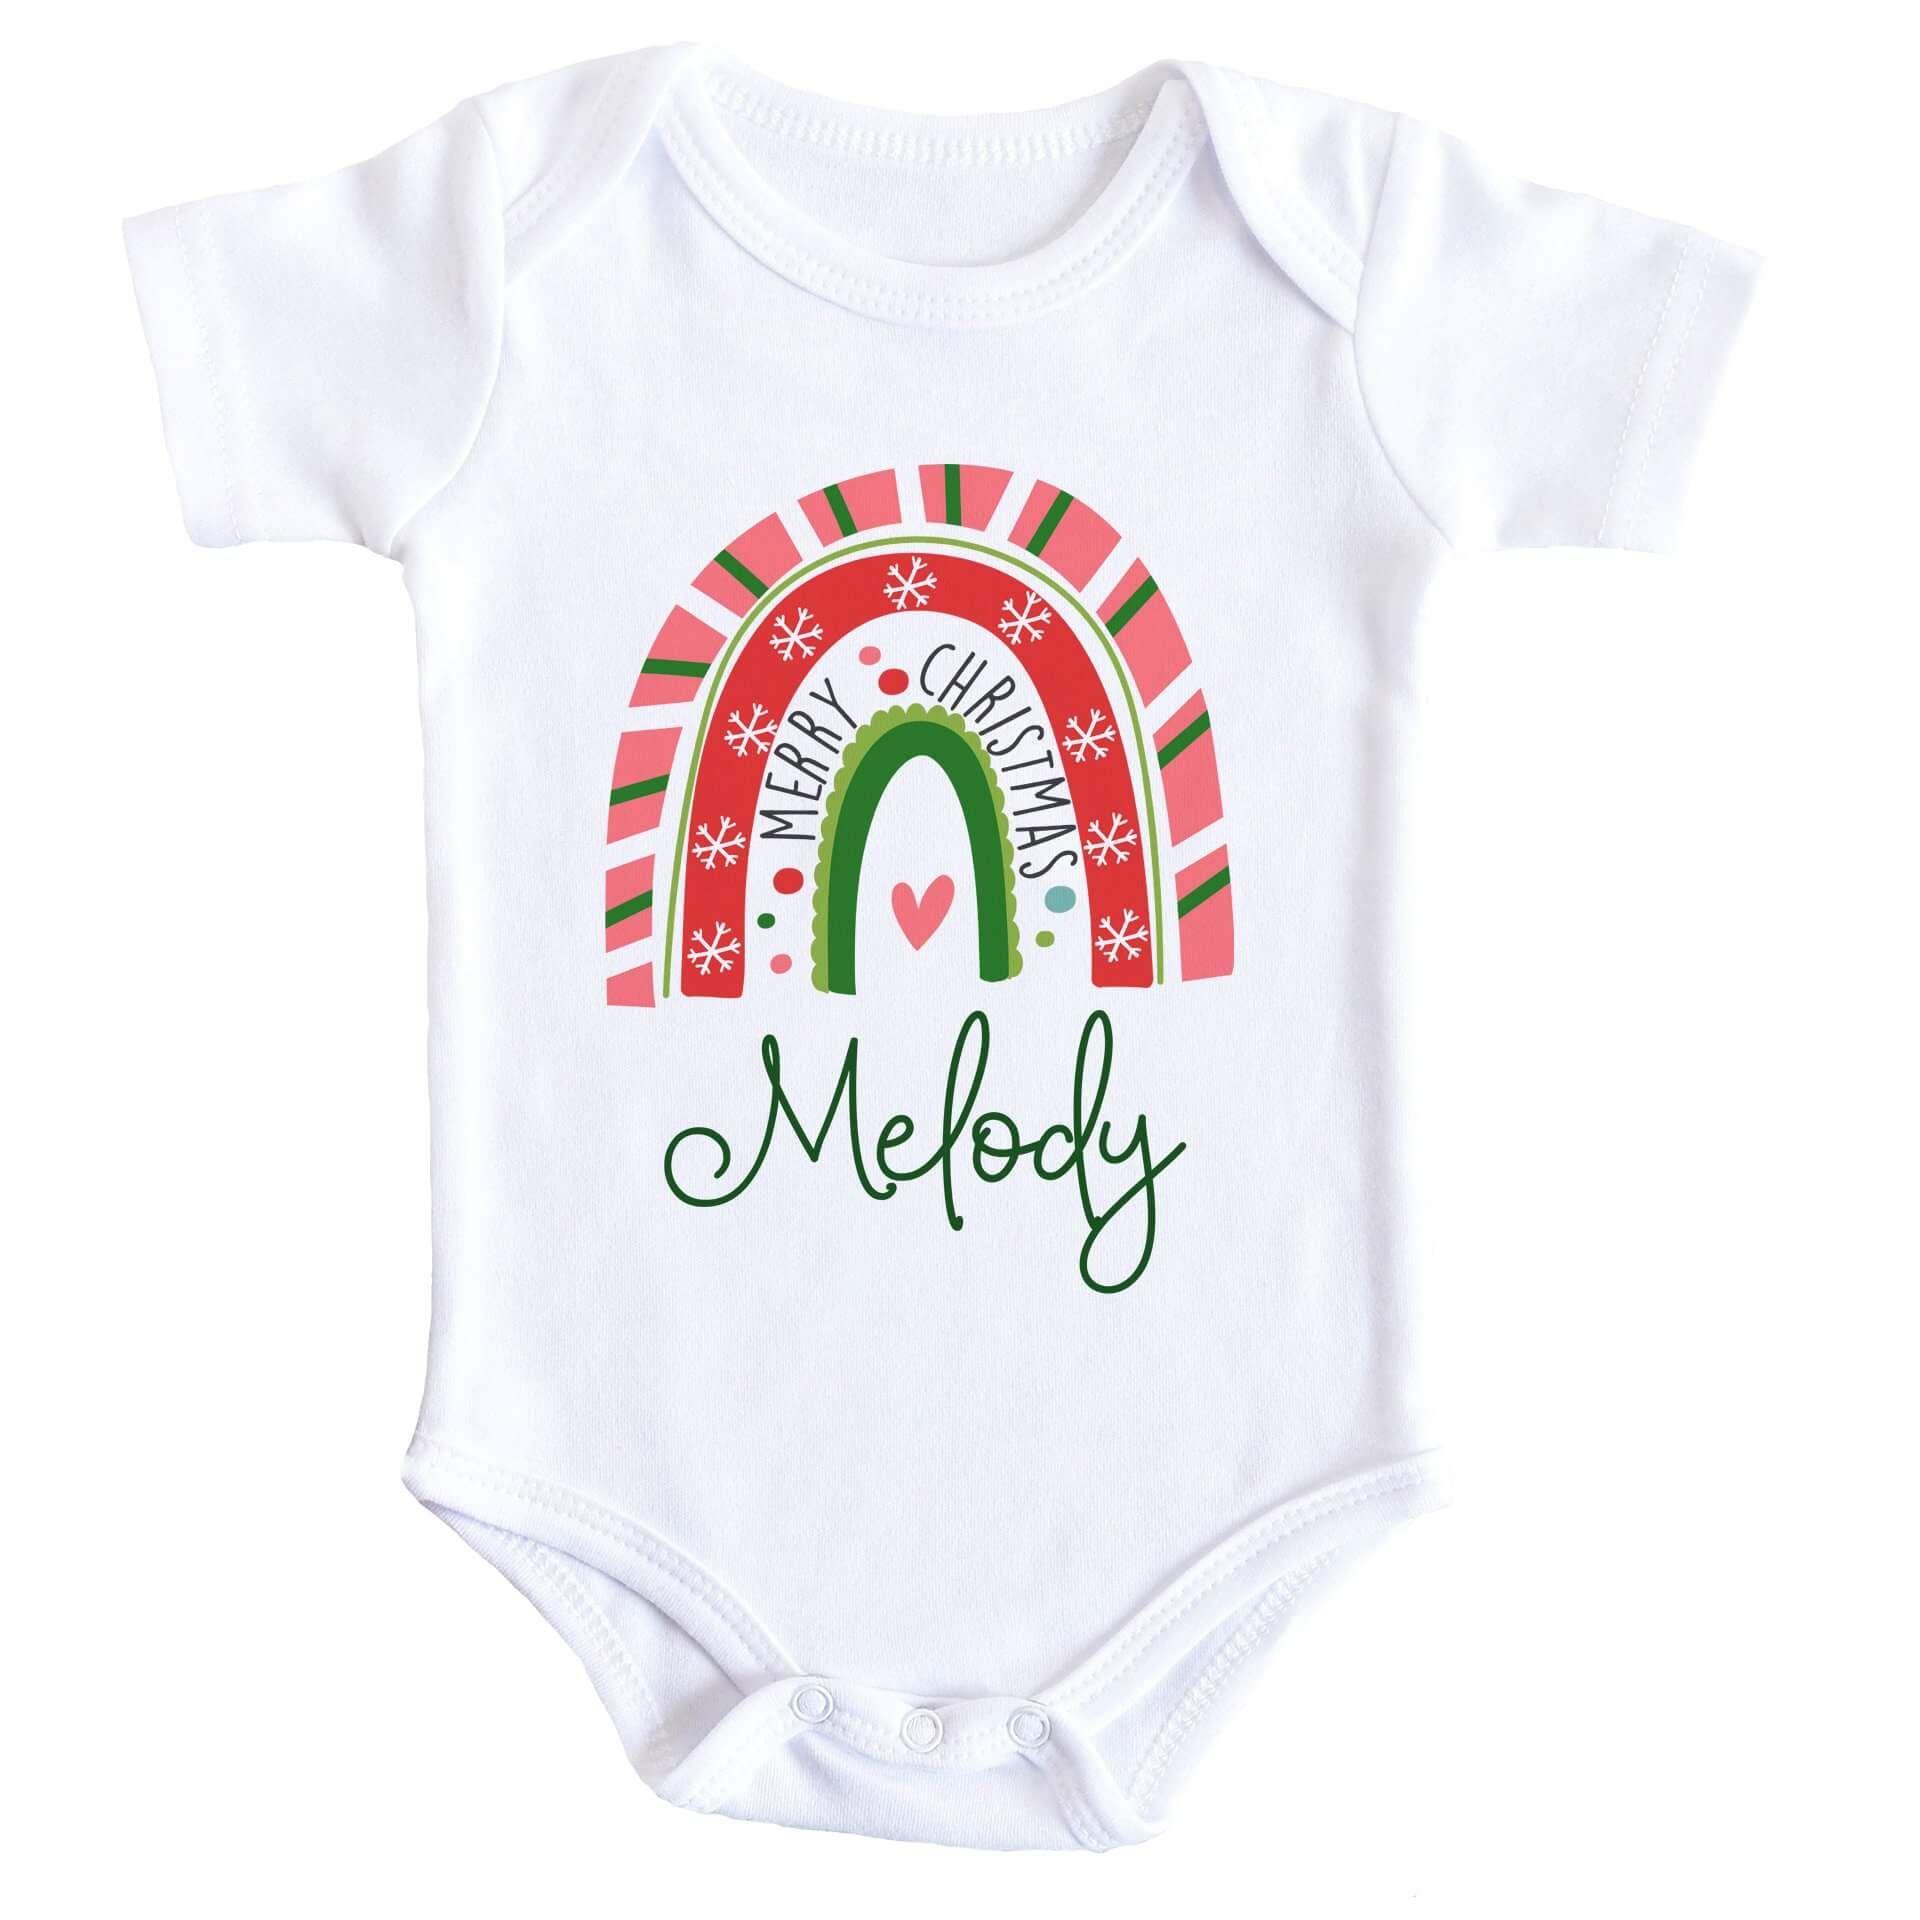 Merry Christmas Rainbow Personalised Baby Bodysuit - Newborn / Long Sleeve